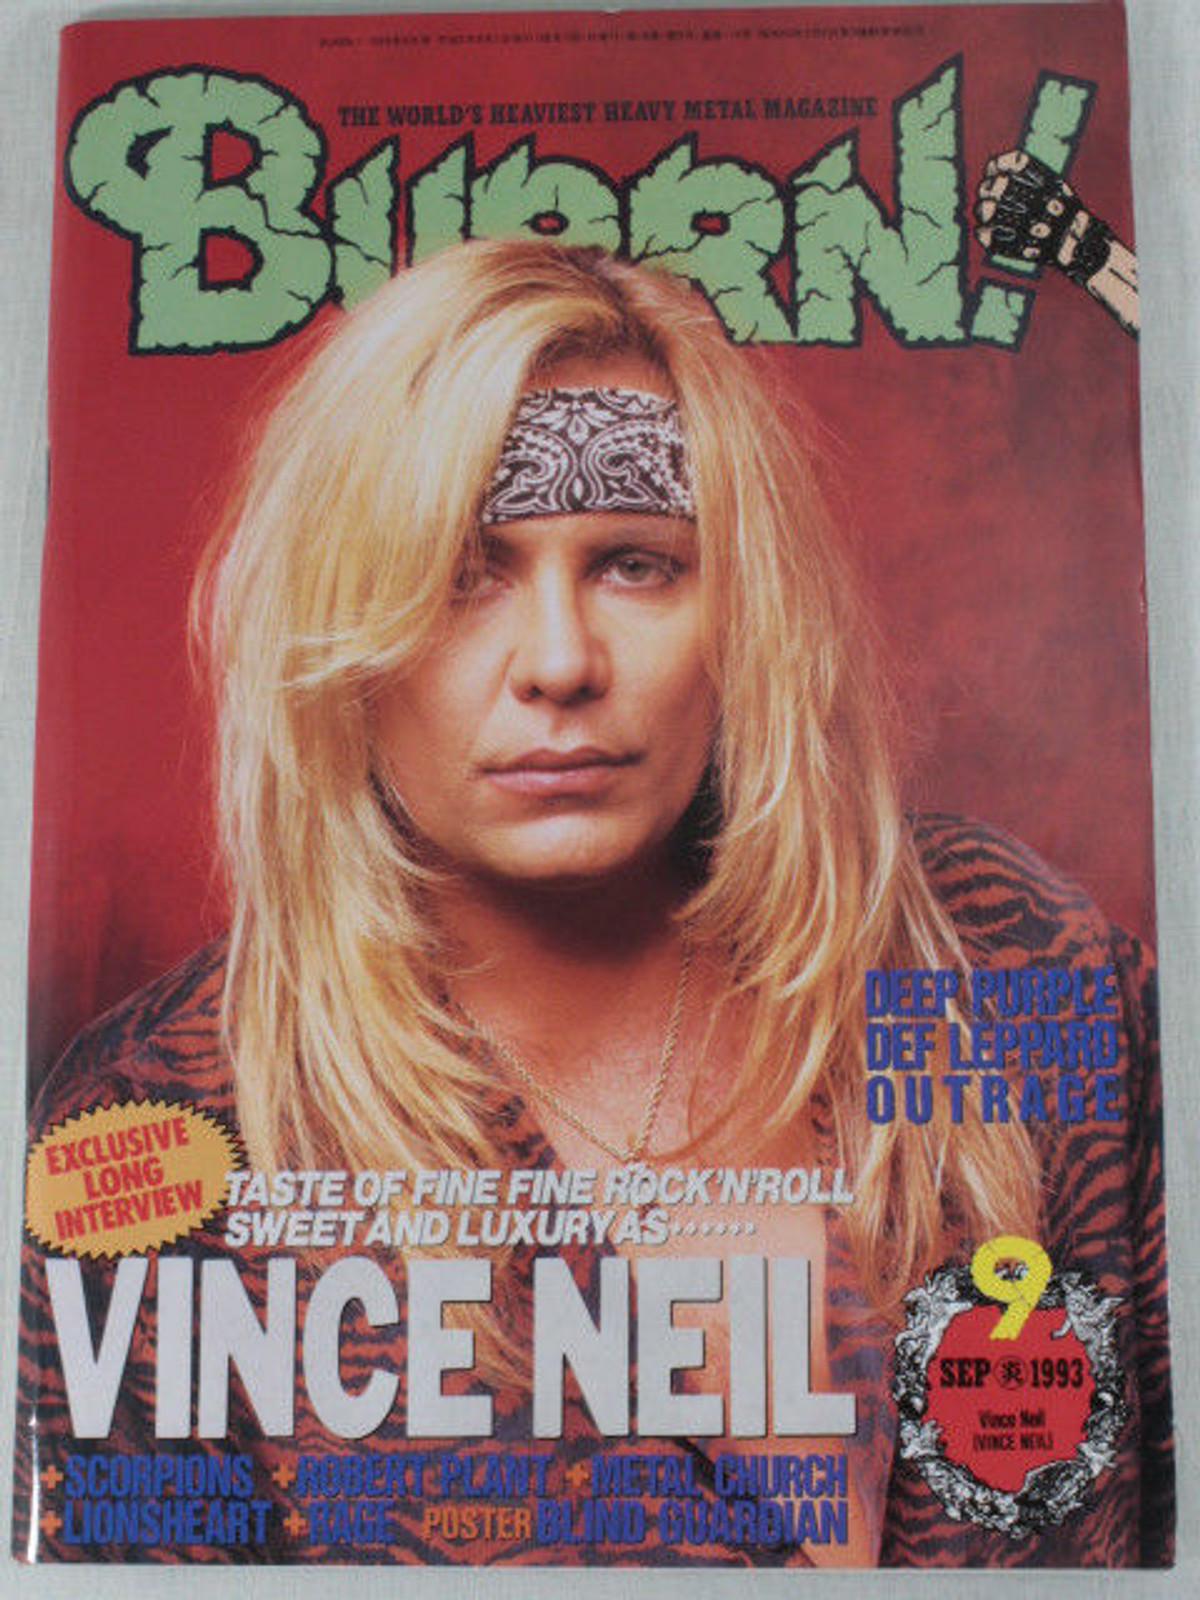 1993/09 BURRN! Japan Rock Magazine VINCE NEIL/SCORPIONS/METAL CHURCH/LIONSHEART